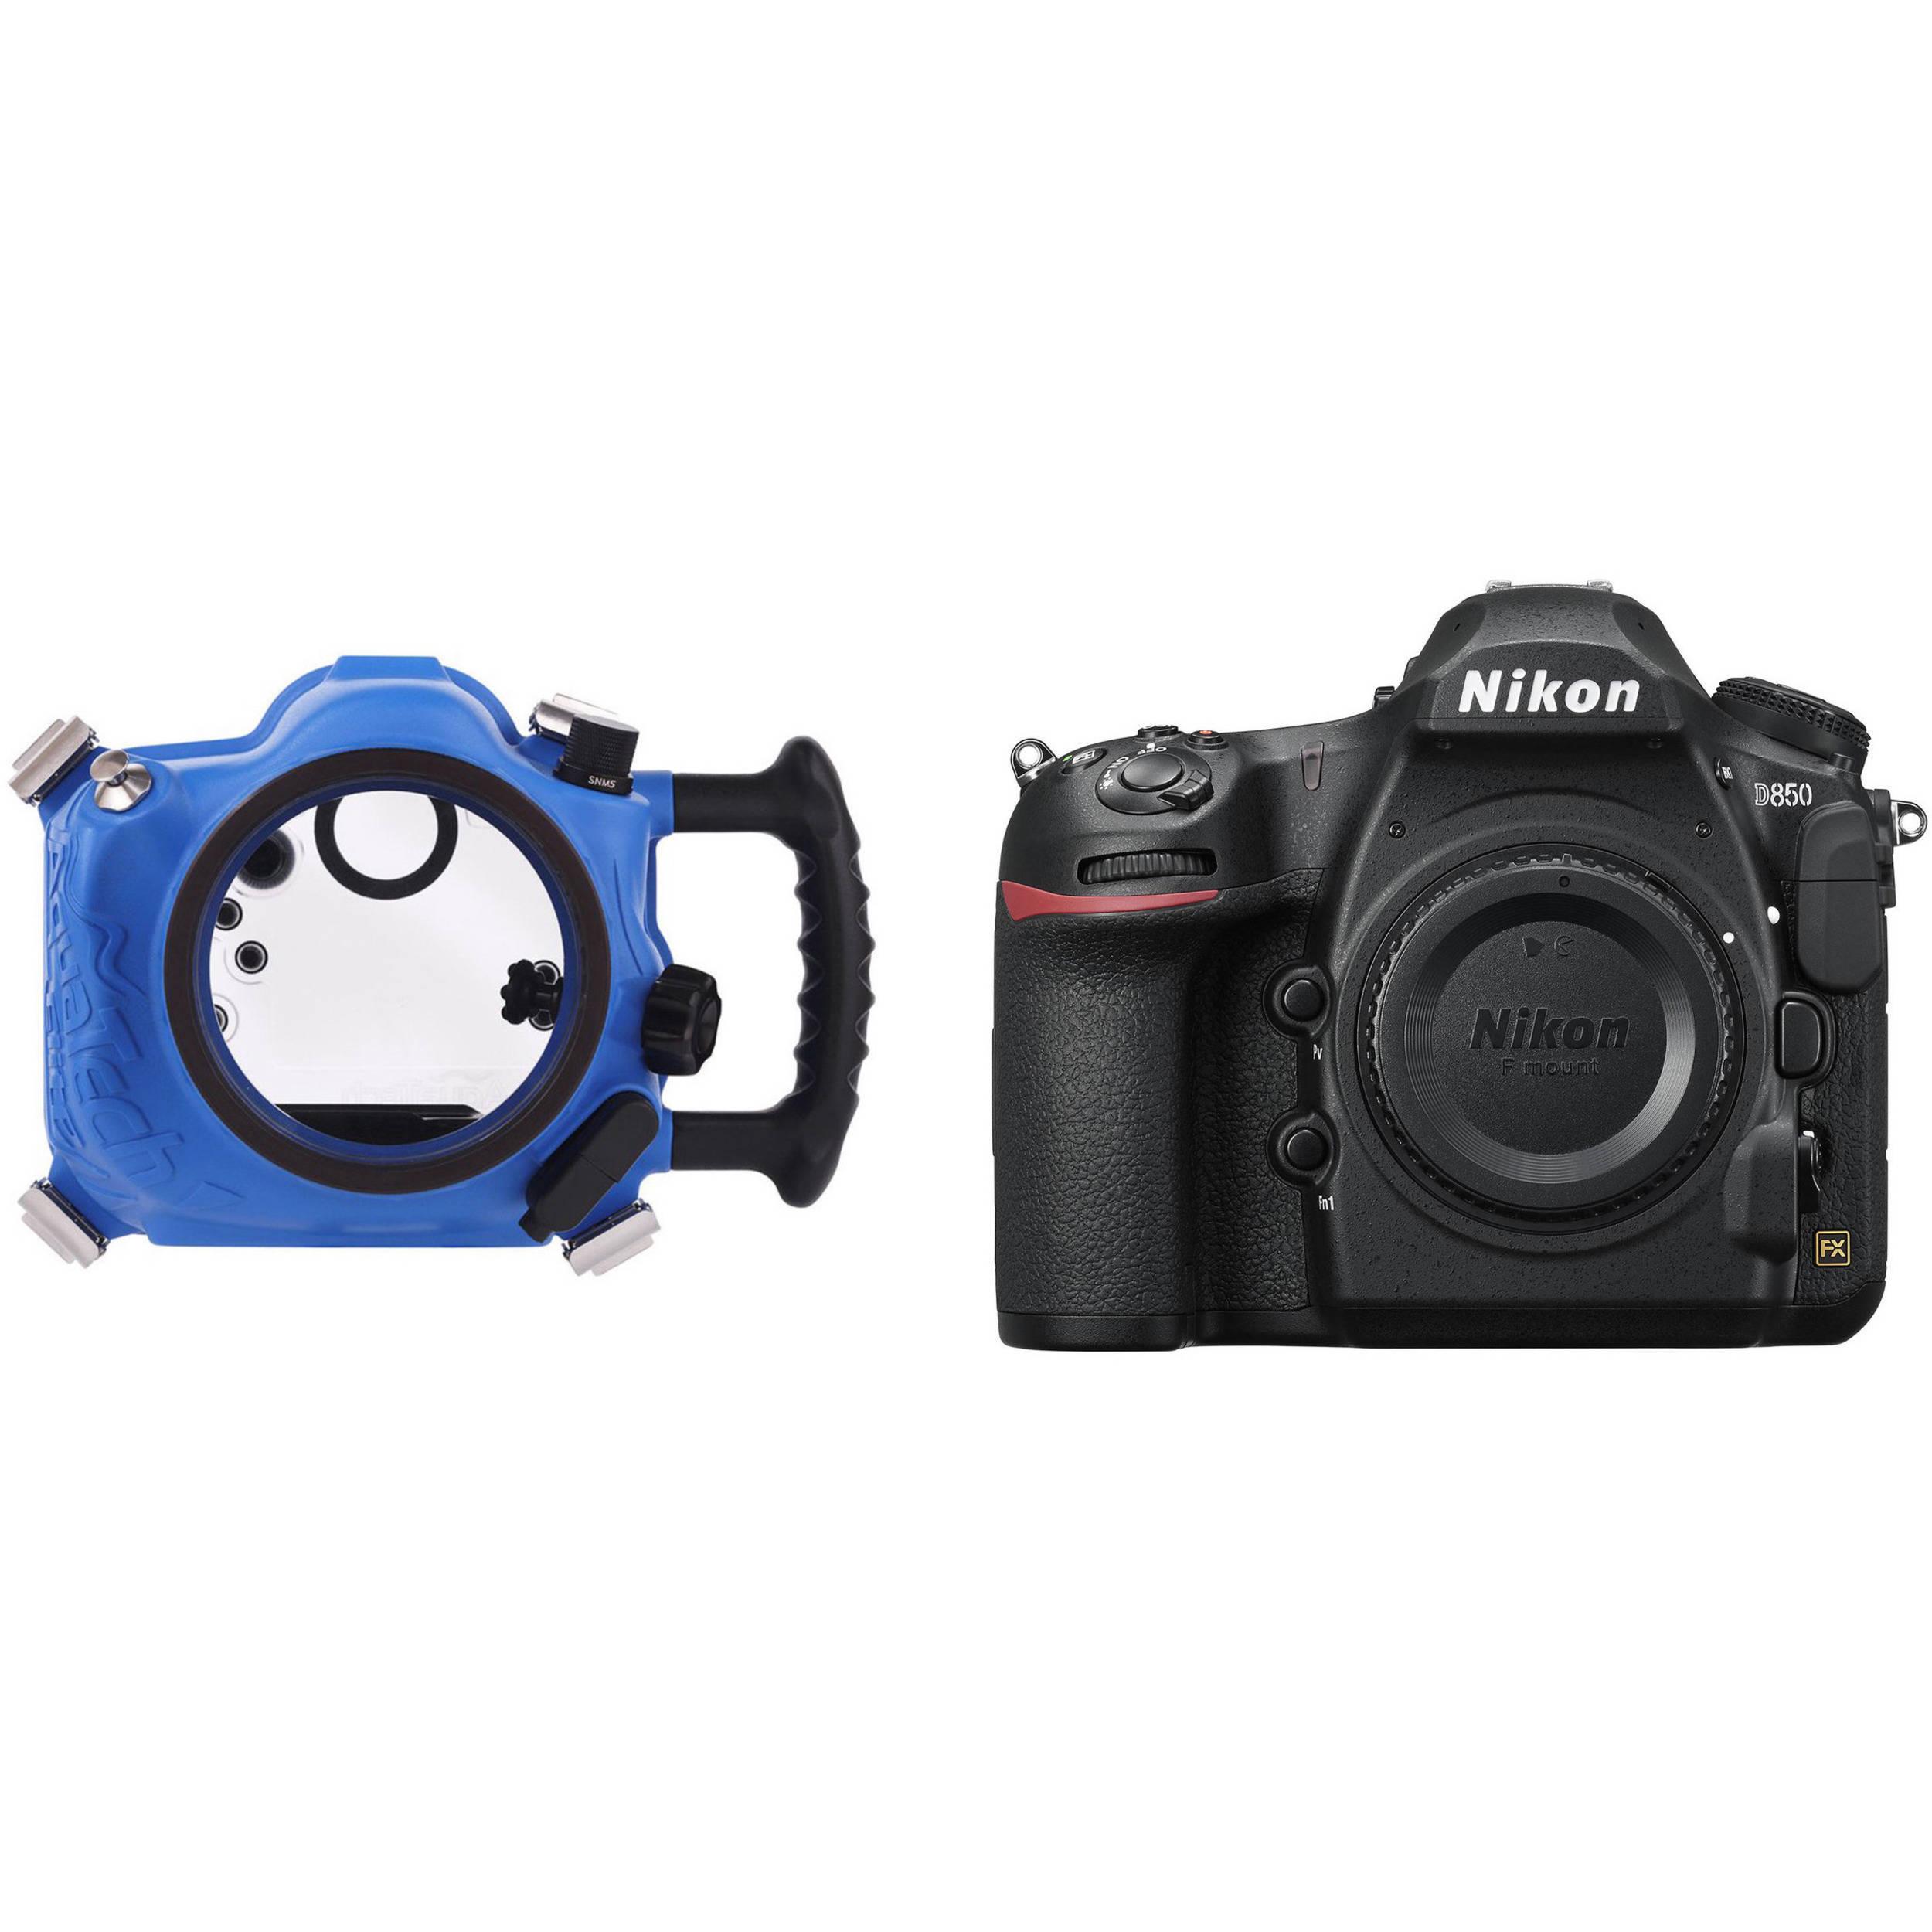 AquaTech Elite Underwater Housing and Nikon D850 DSLR Camera Body Kit